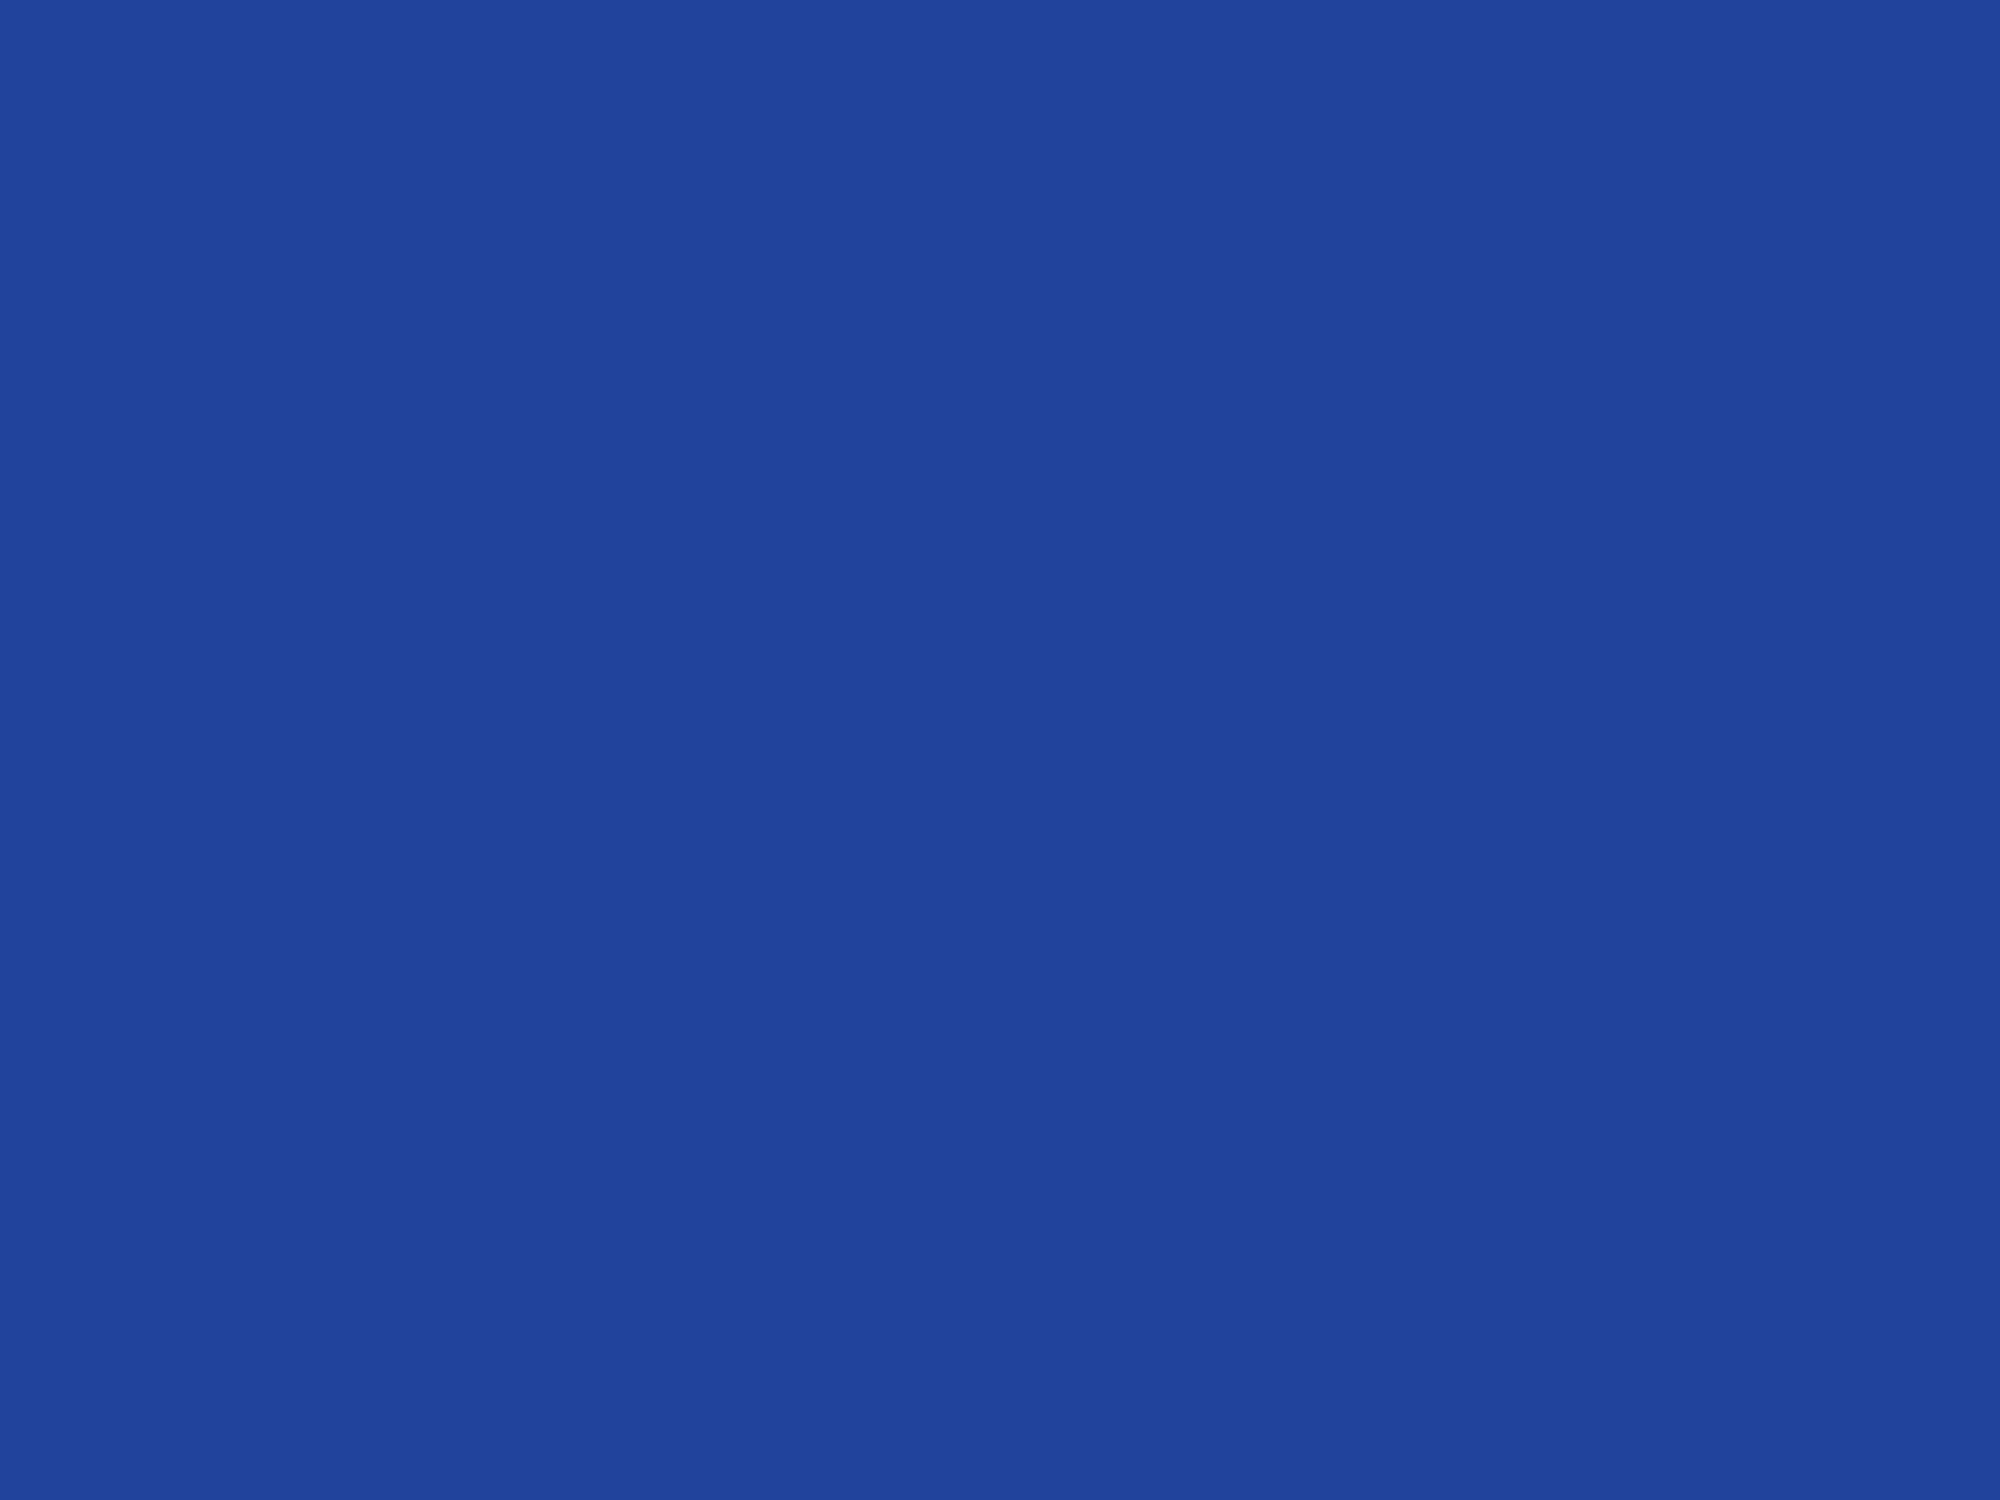 azulback